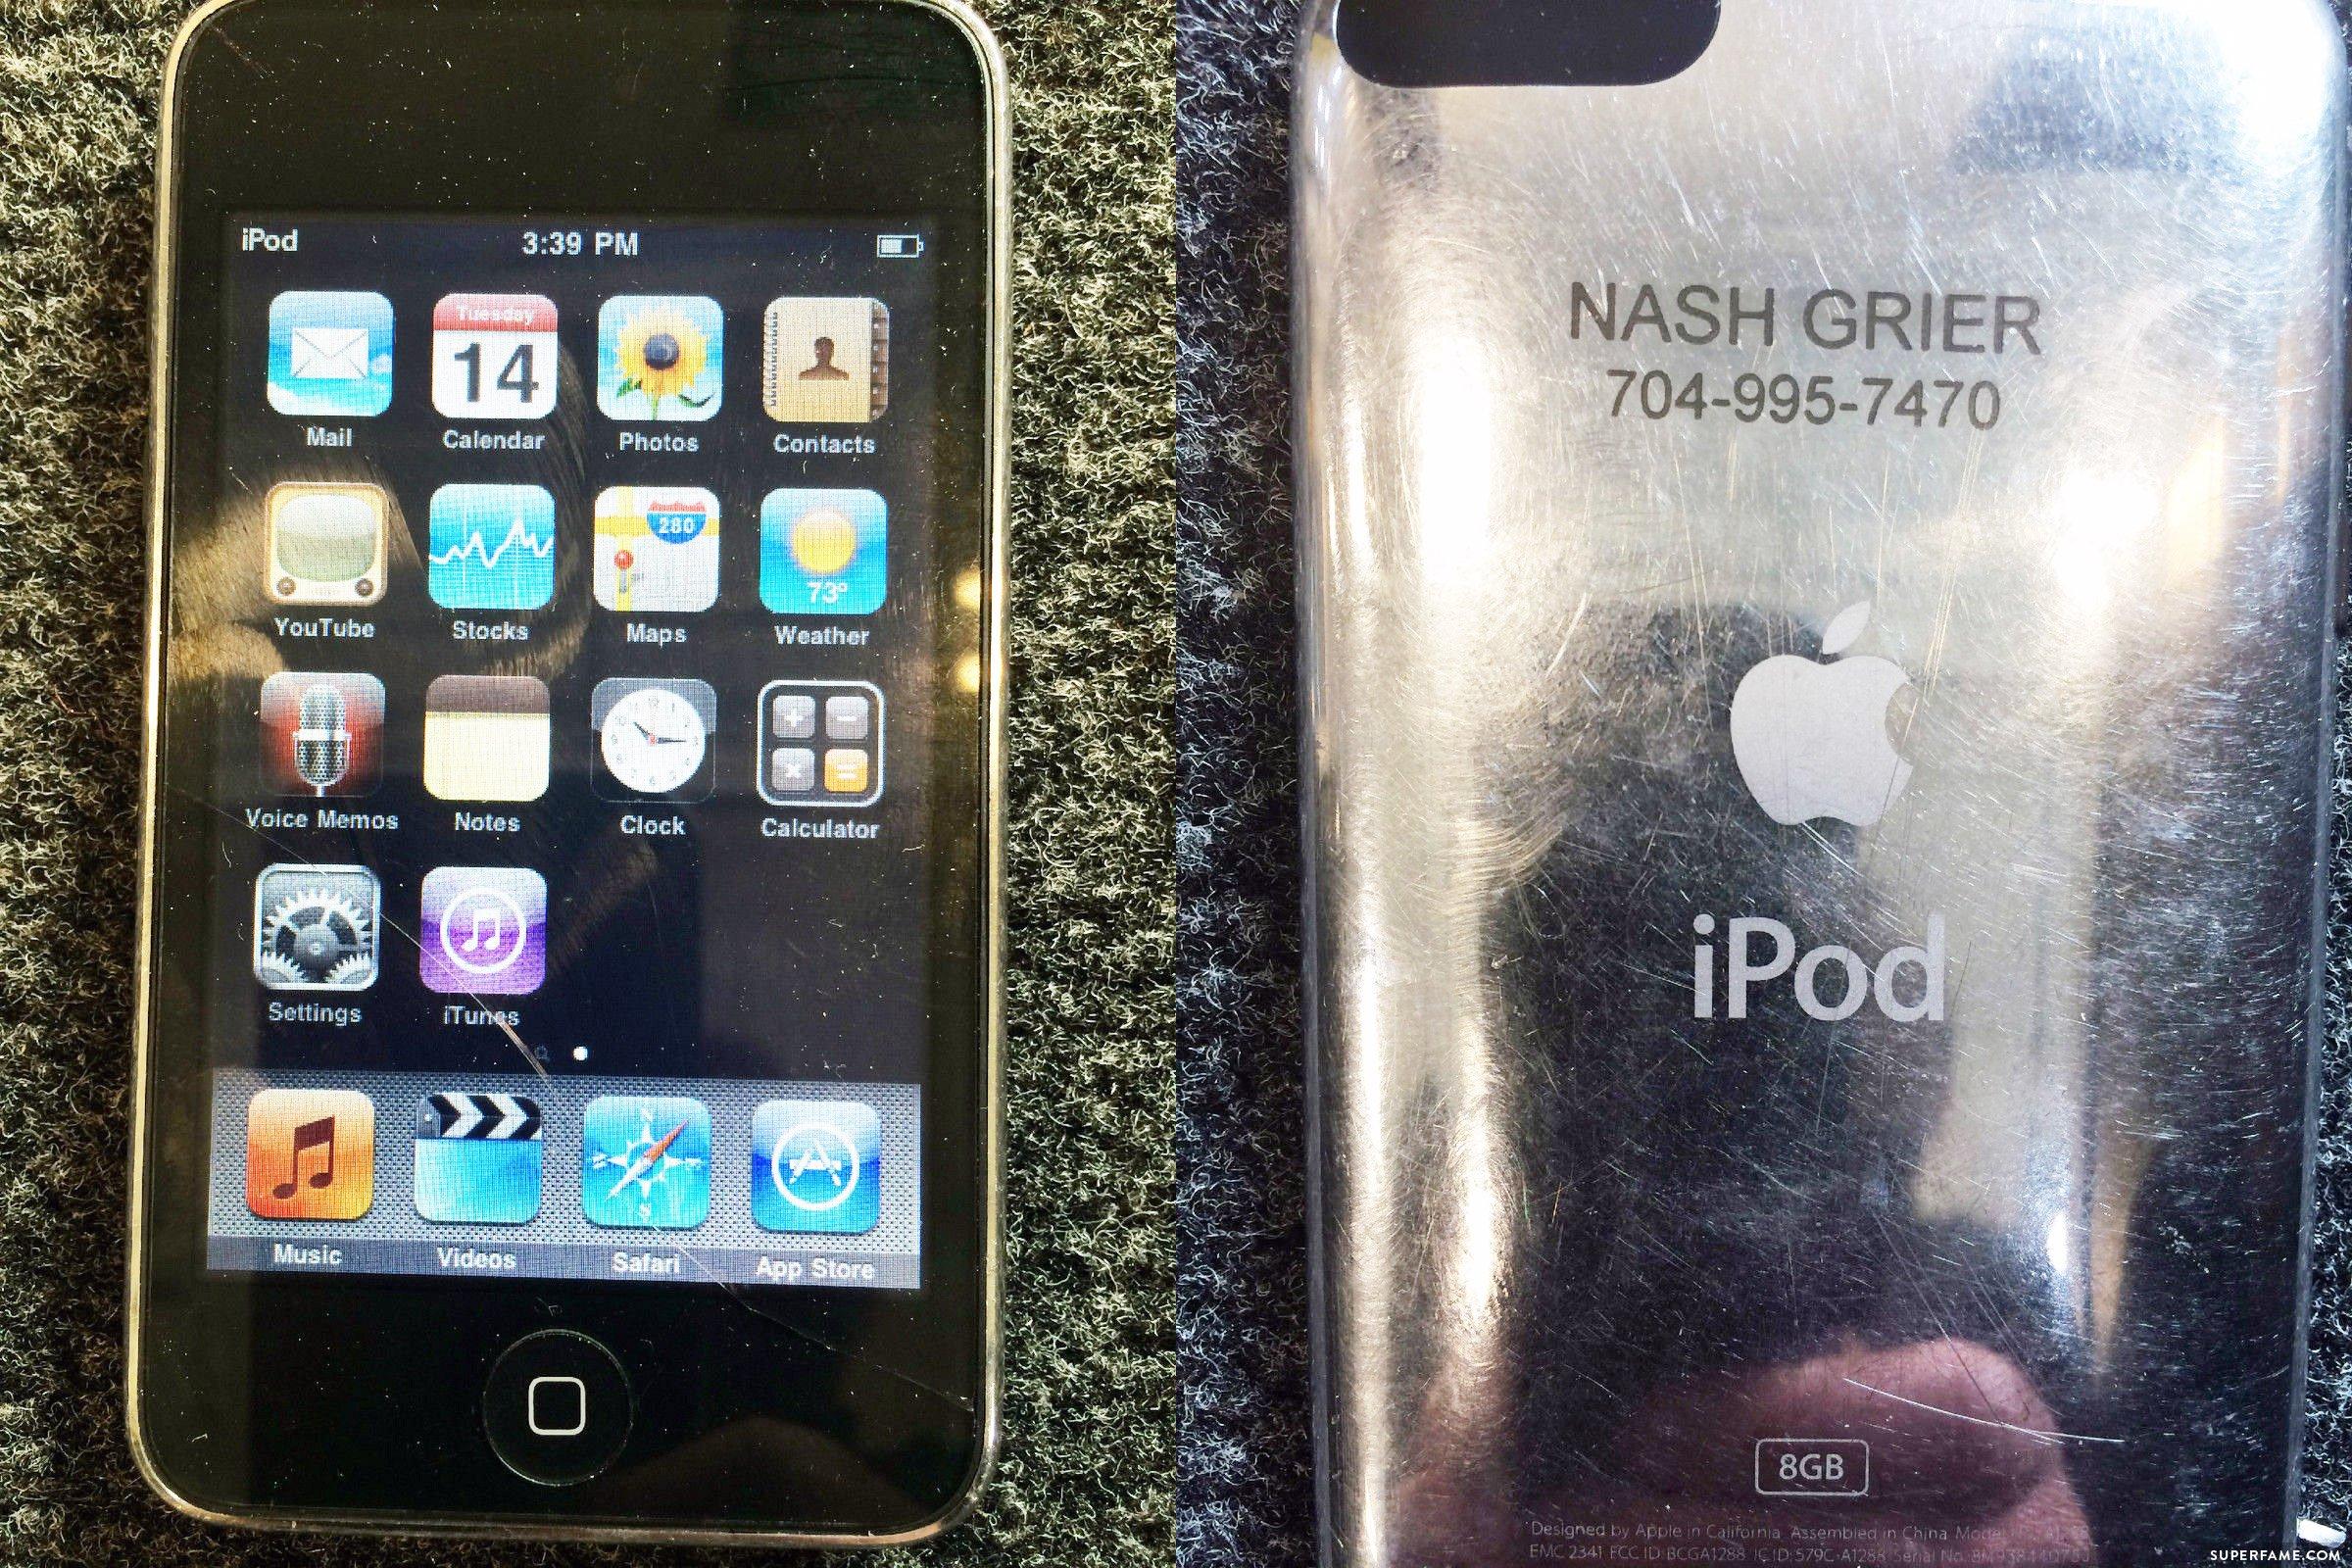 Nash Grier's iPod engraving.